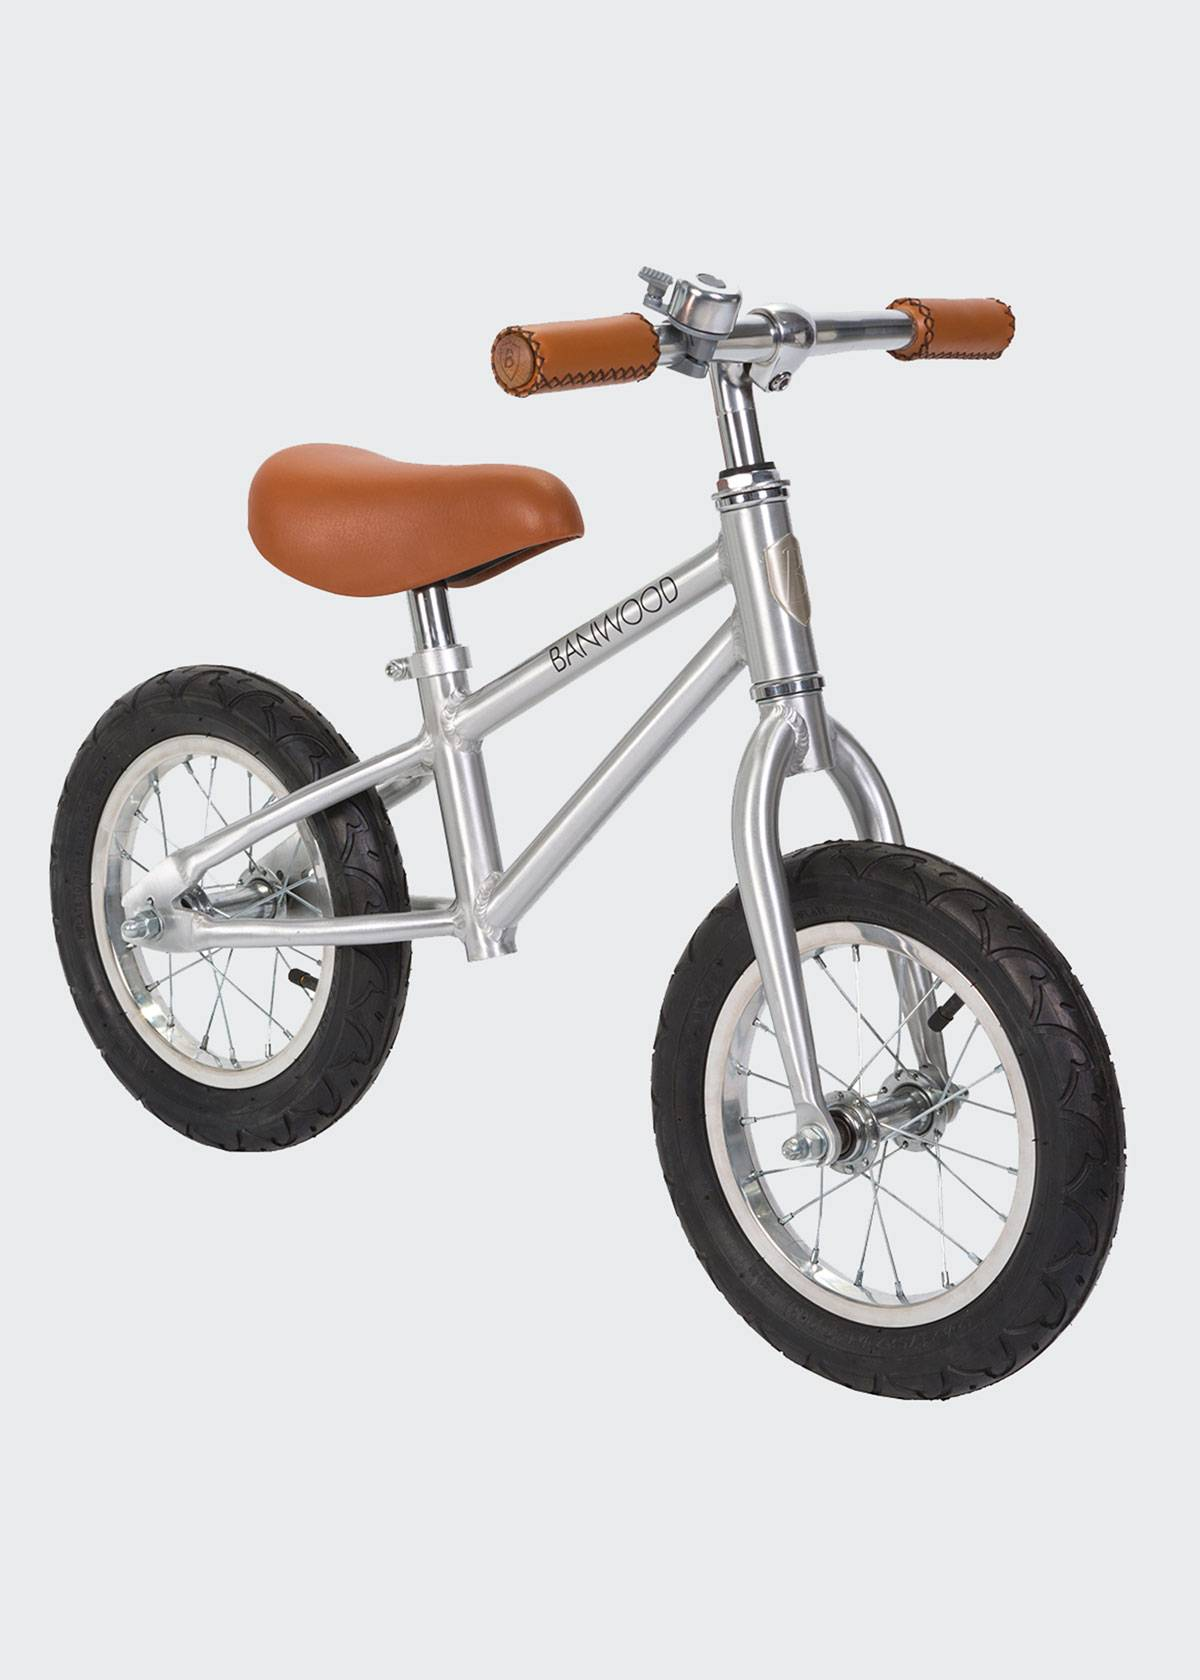 Banwood Kid's First Go Balance Bike - Special Edition Chrome  - Size: unisex